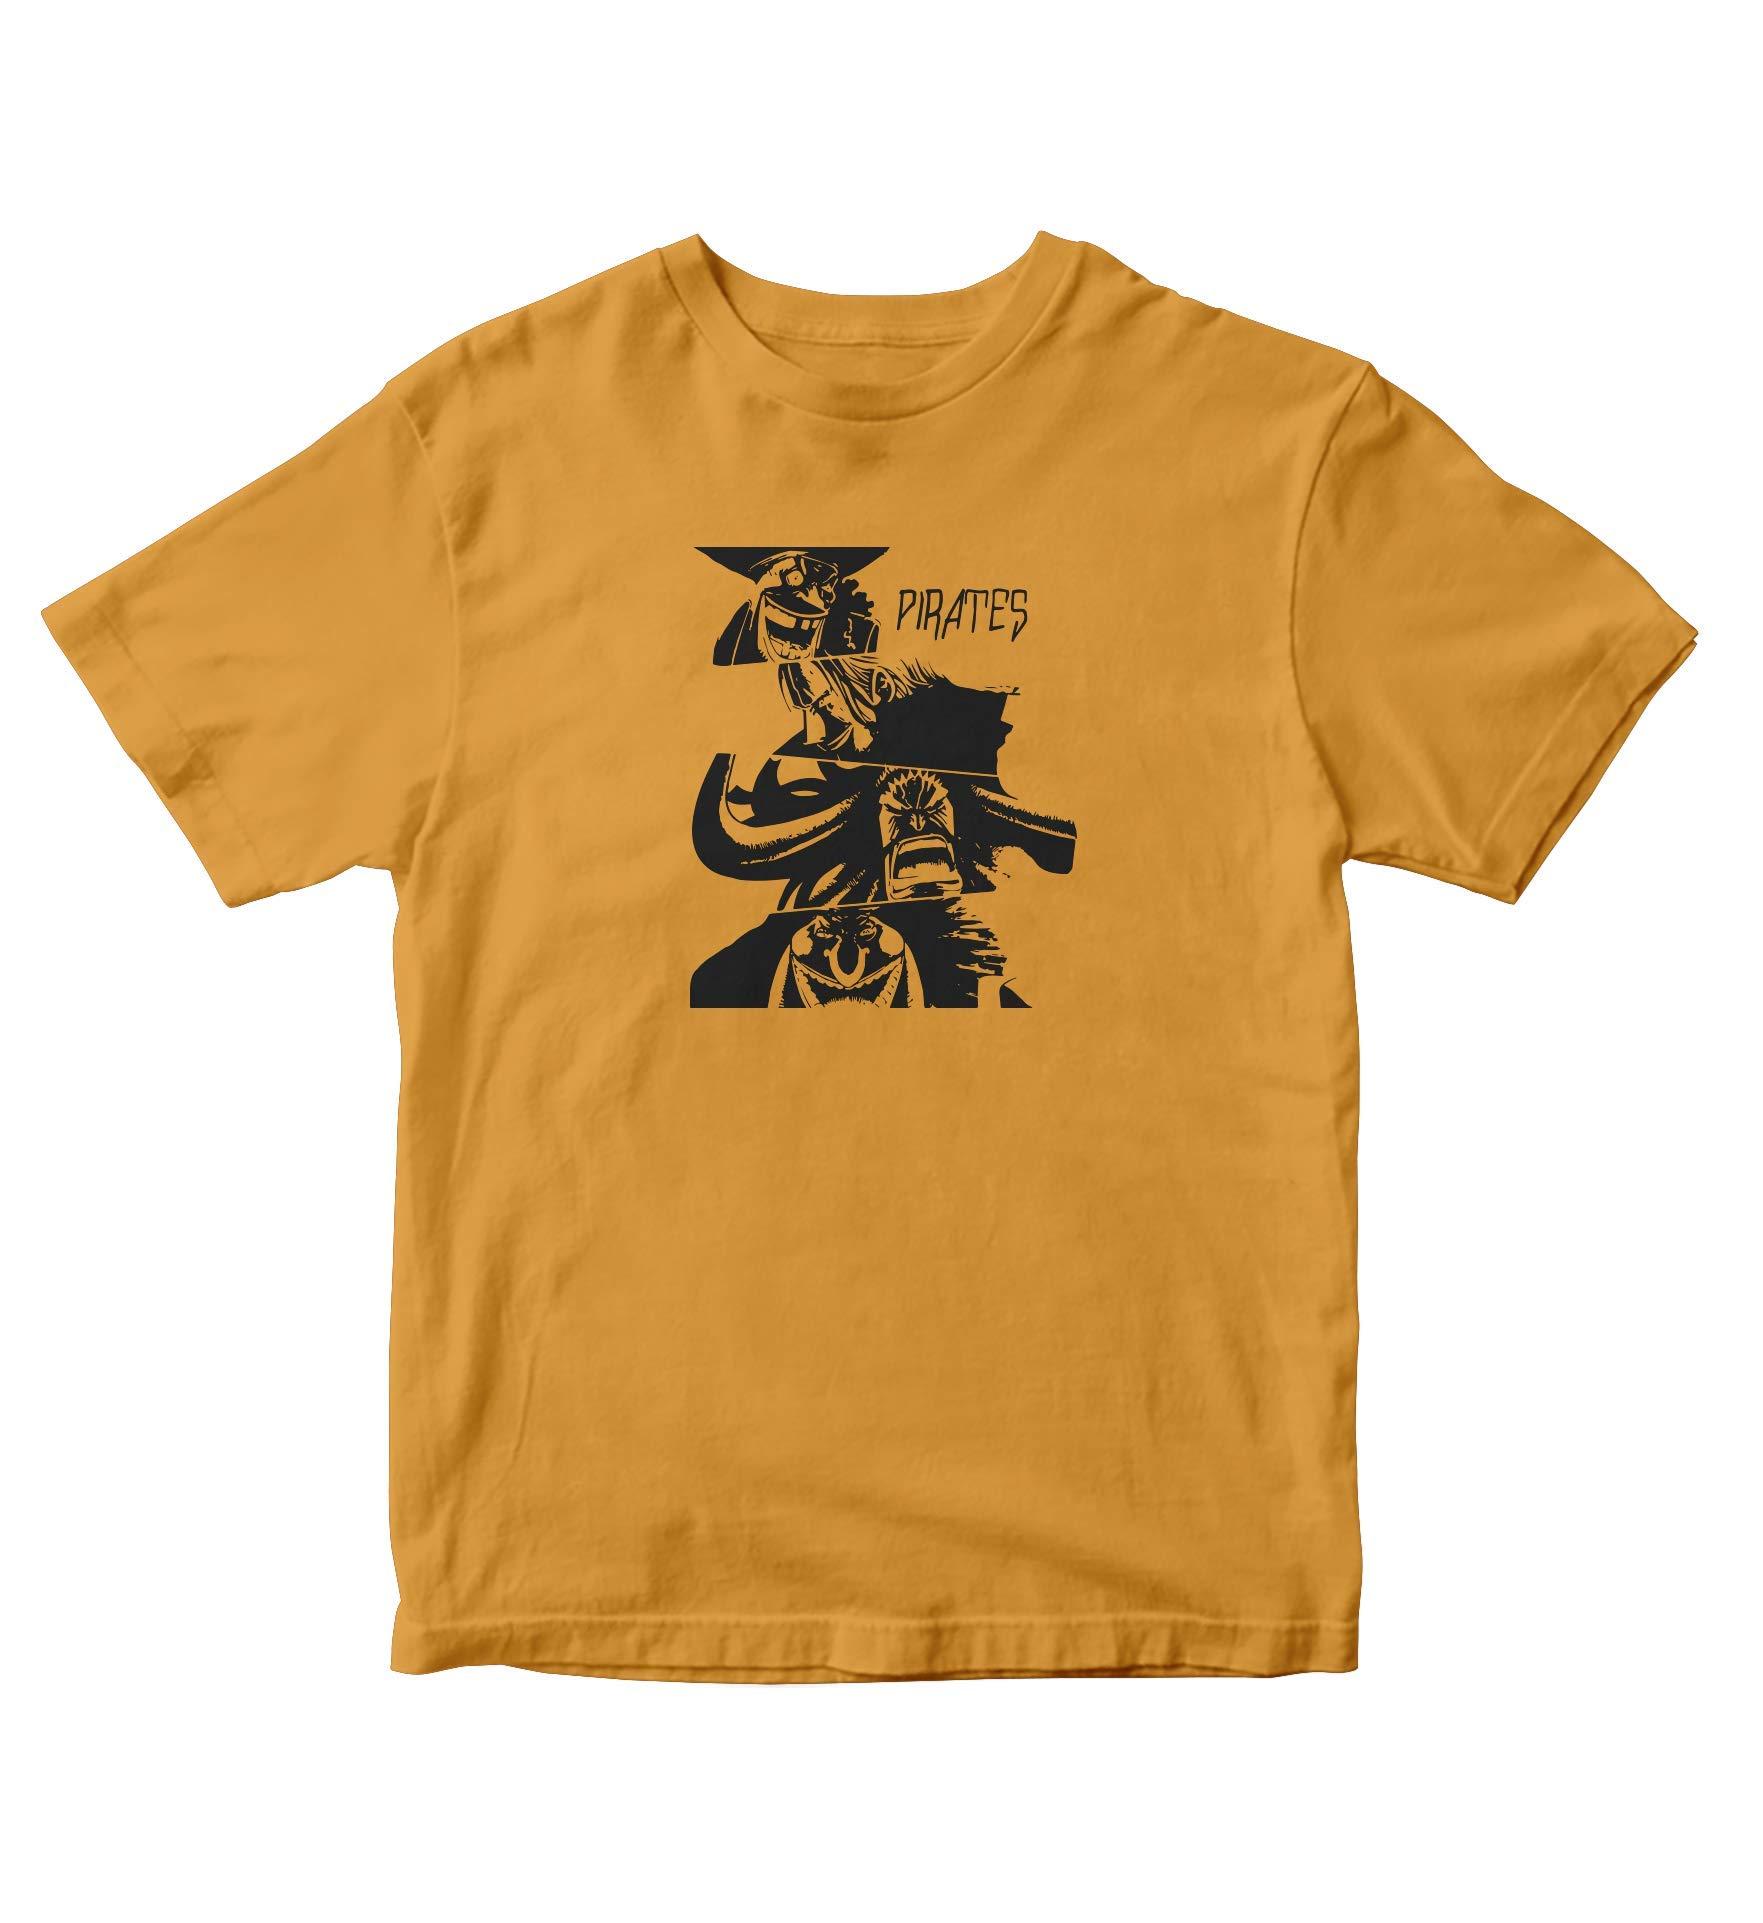 Tjsports One Piece Gold Shirt Pirates Of Piece Anime Manga S A746